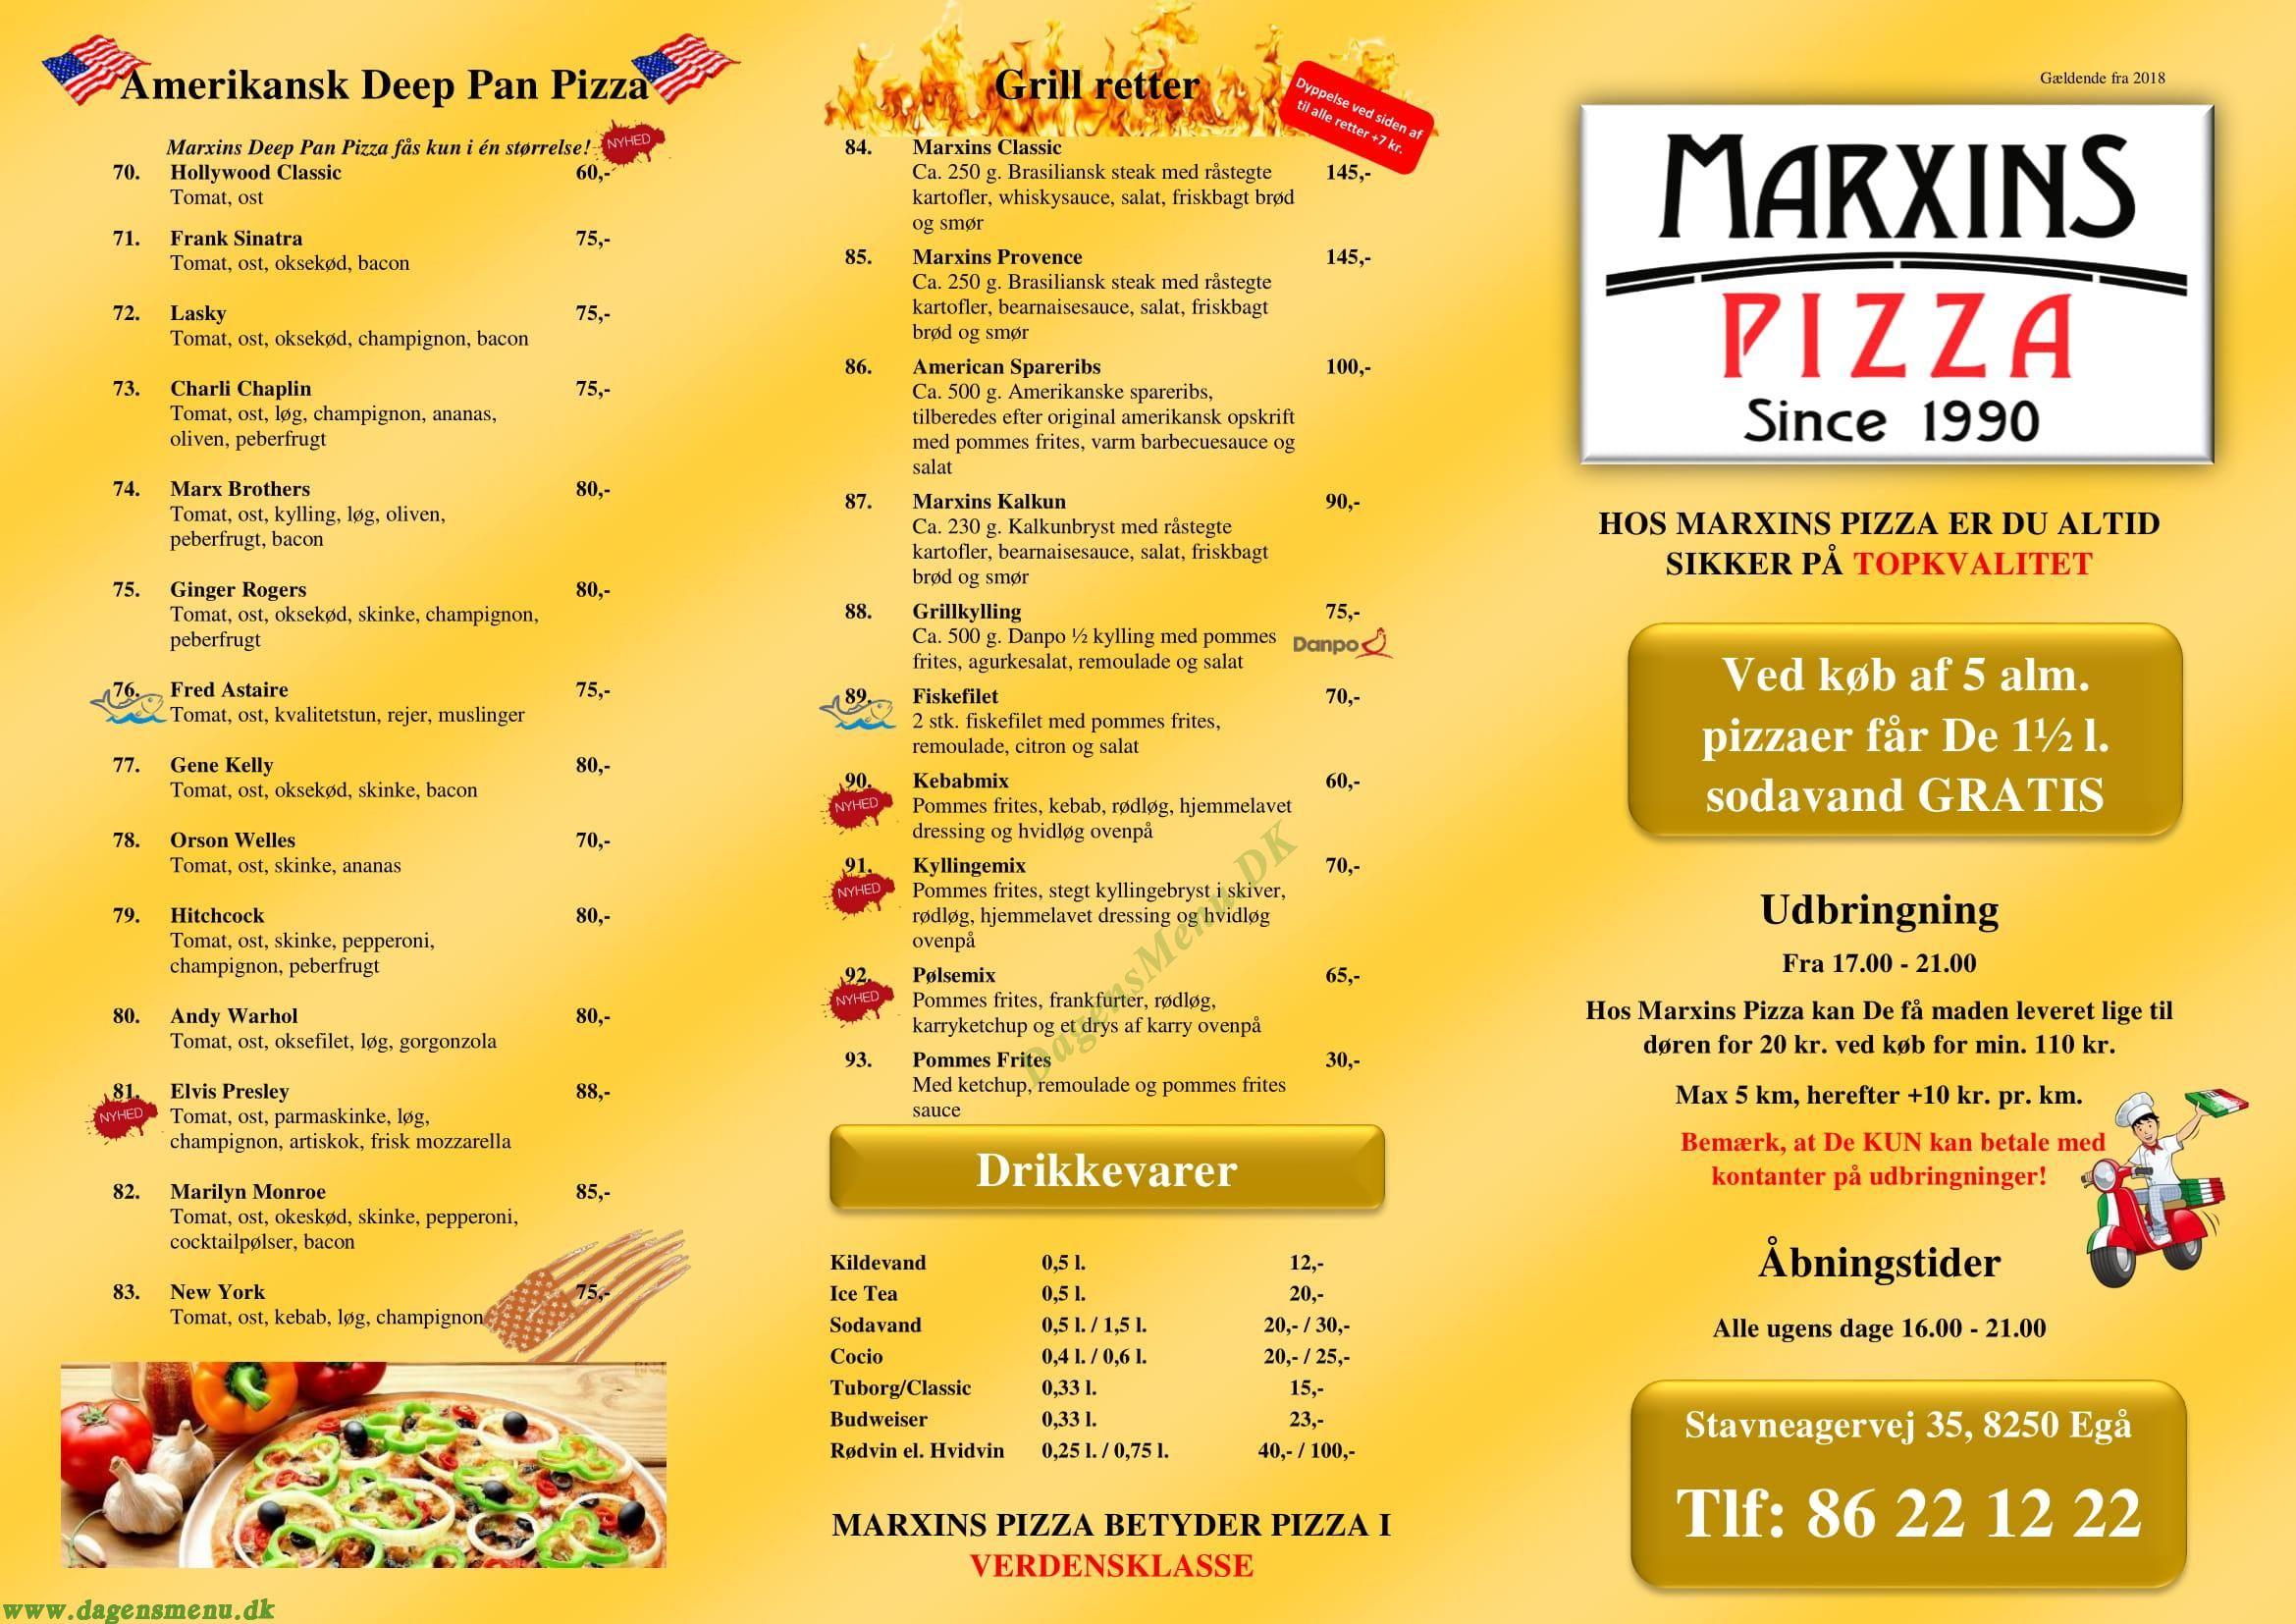 Marxins Pizza & Steak - Menukort